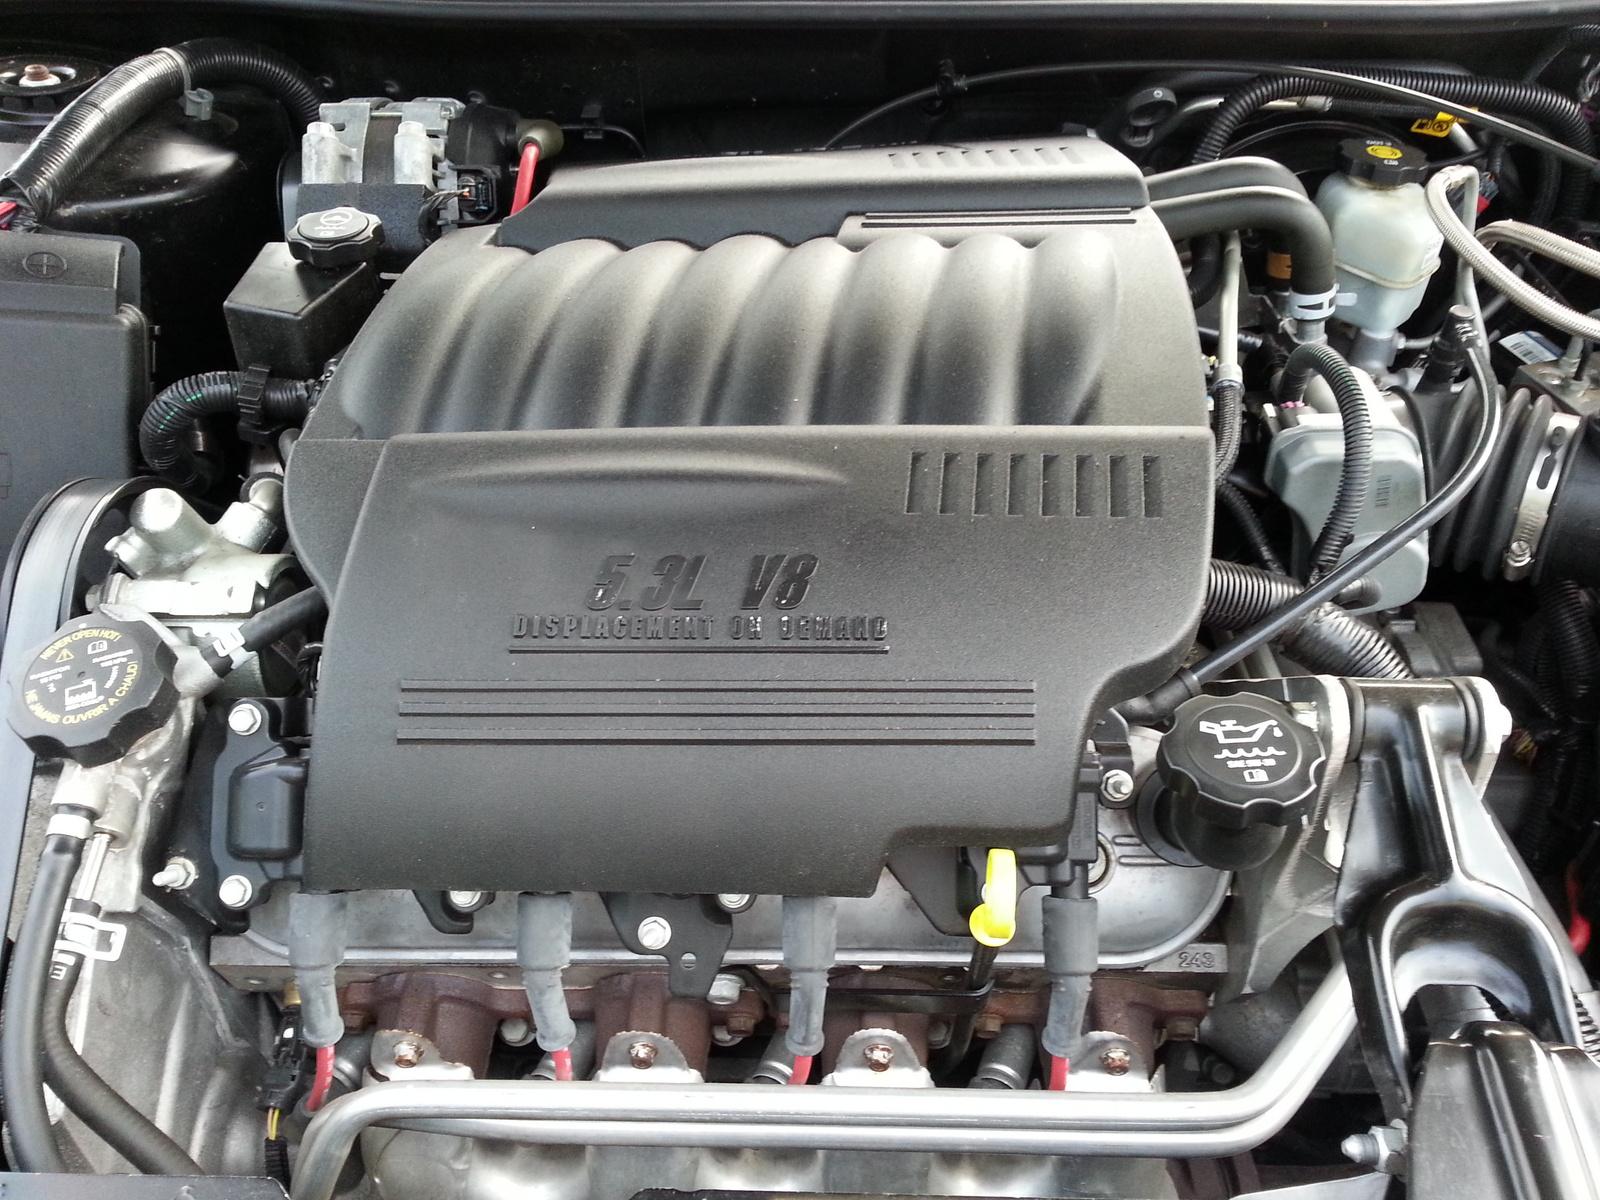 picture of 2006 chevrolet impala ss engine. Black Bedroom Furniture Sets. Home Design Ideas